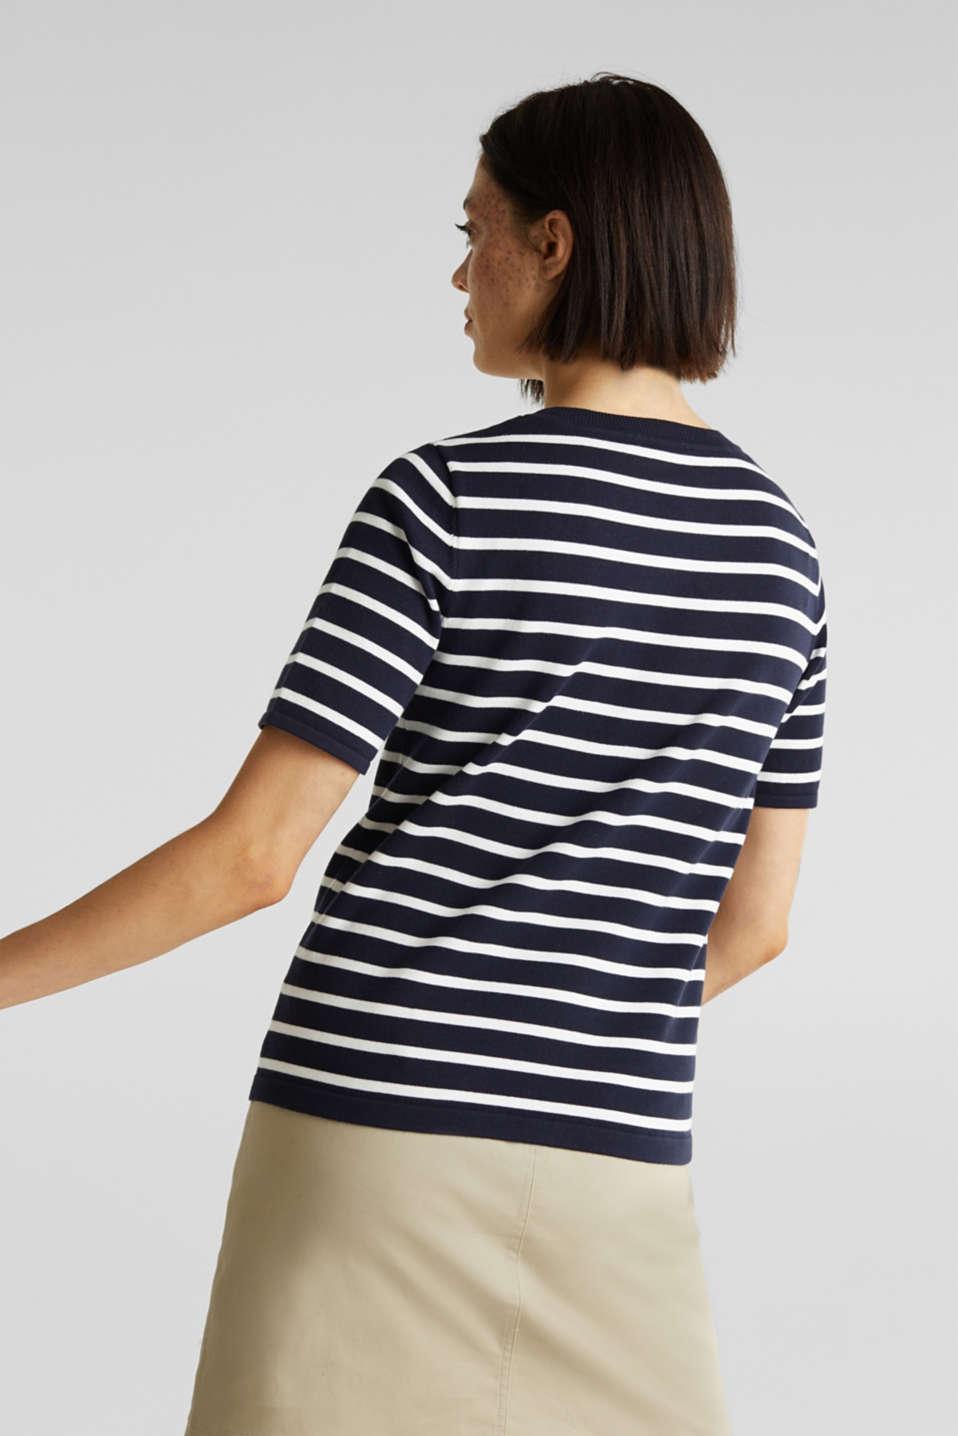 Short-sleeved jumper with a breast pocket, NAVY, detail image number 3